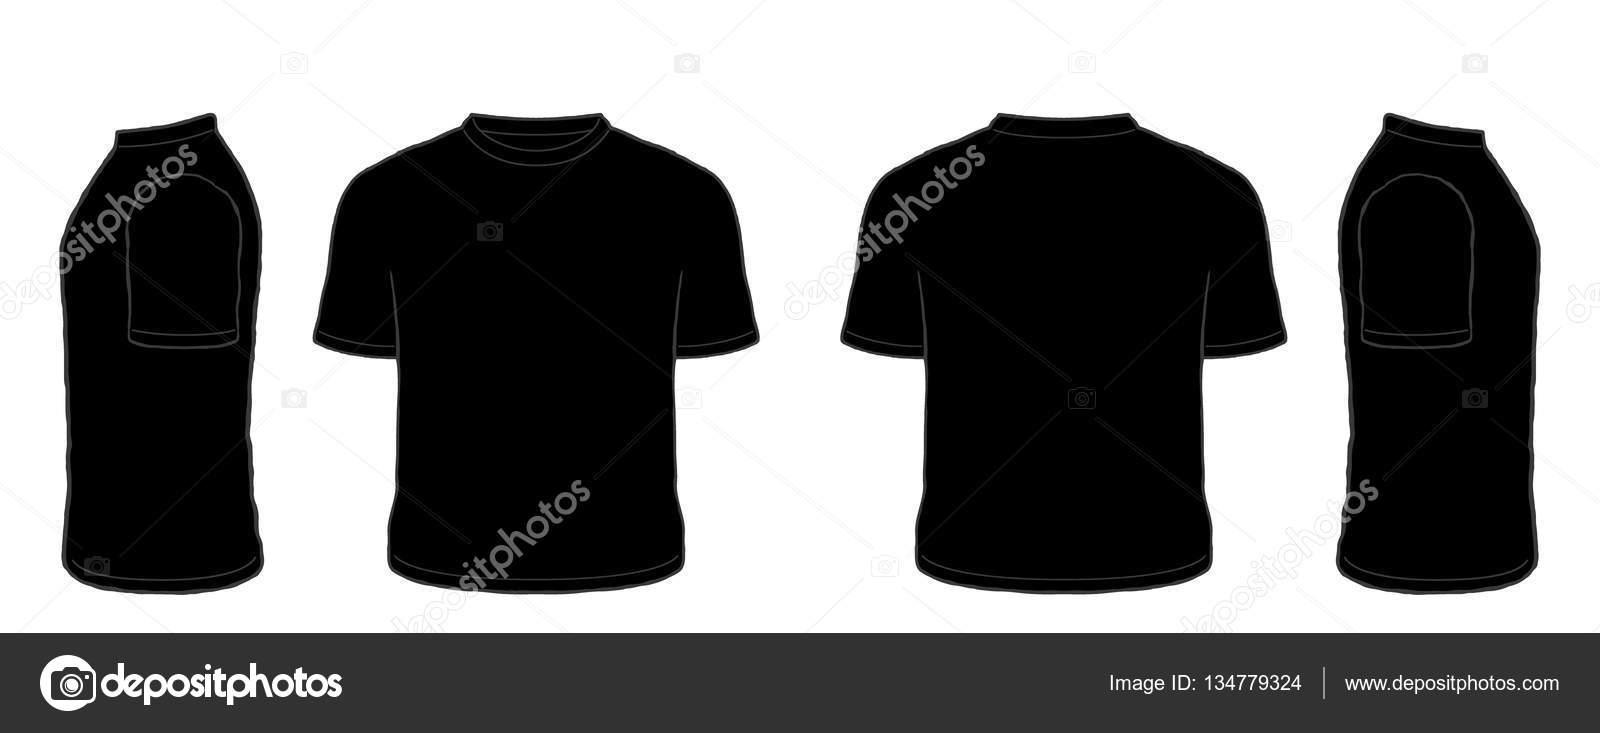 Black t shirt vector photoshop - Black Short Sleeve Tshirt Vector Set Front Side Back Views Stock Illustration